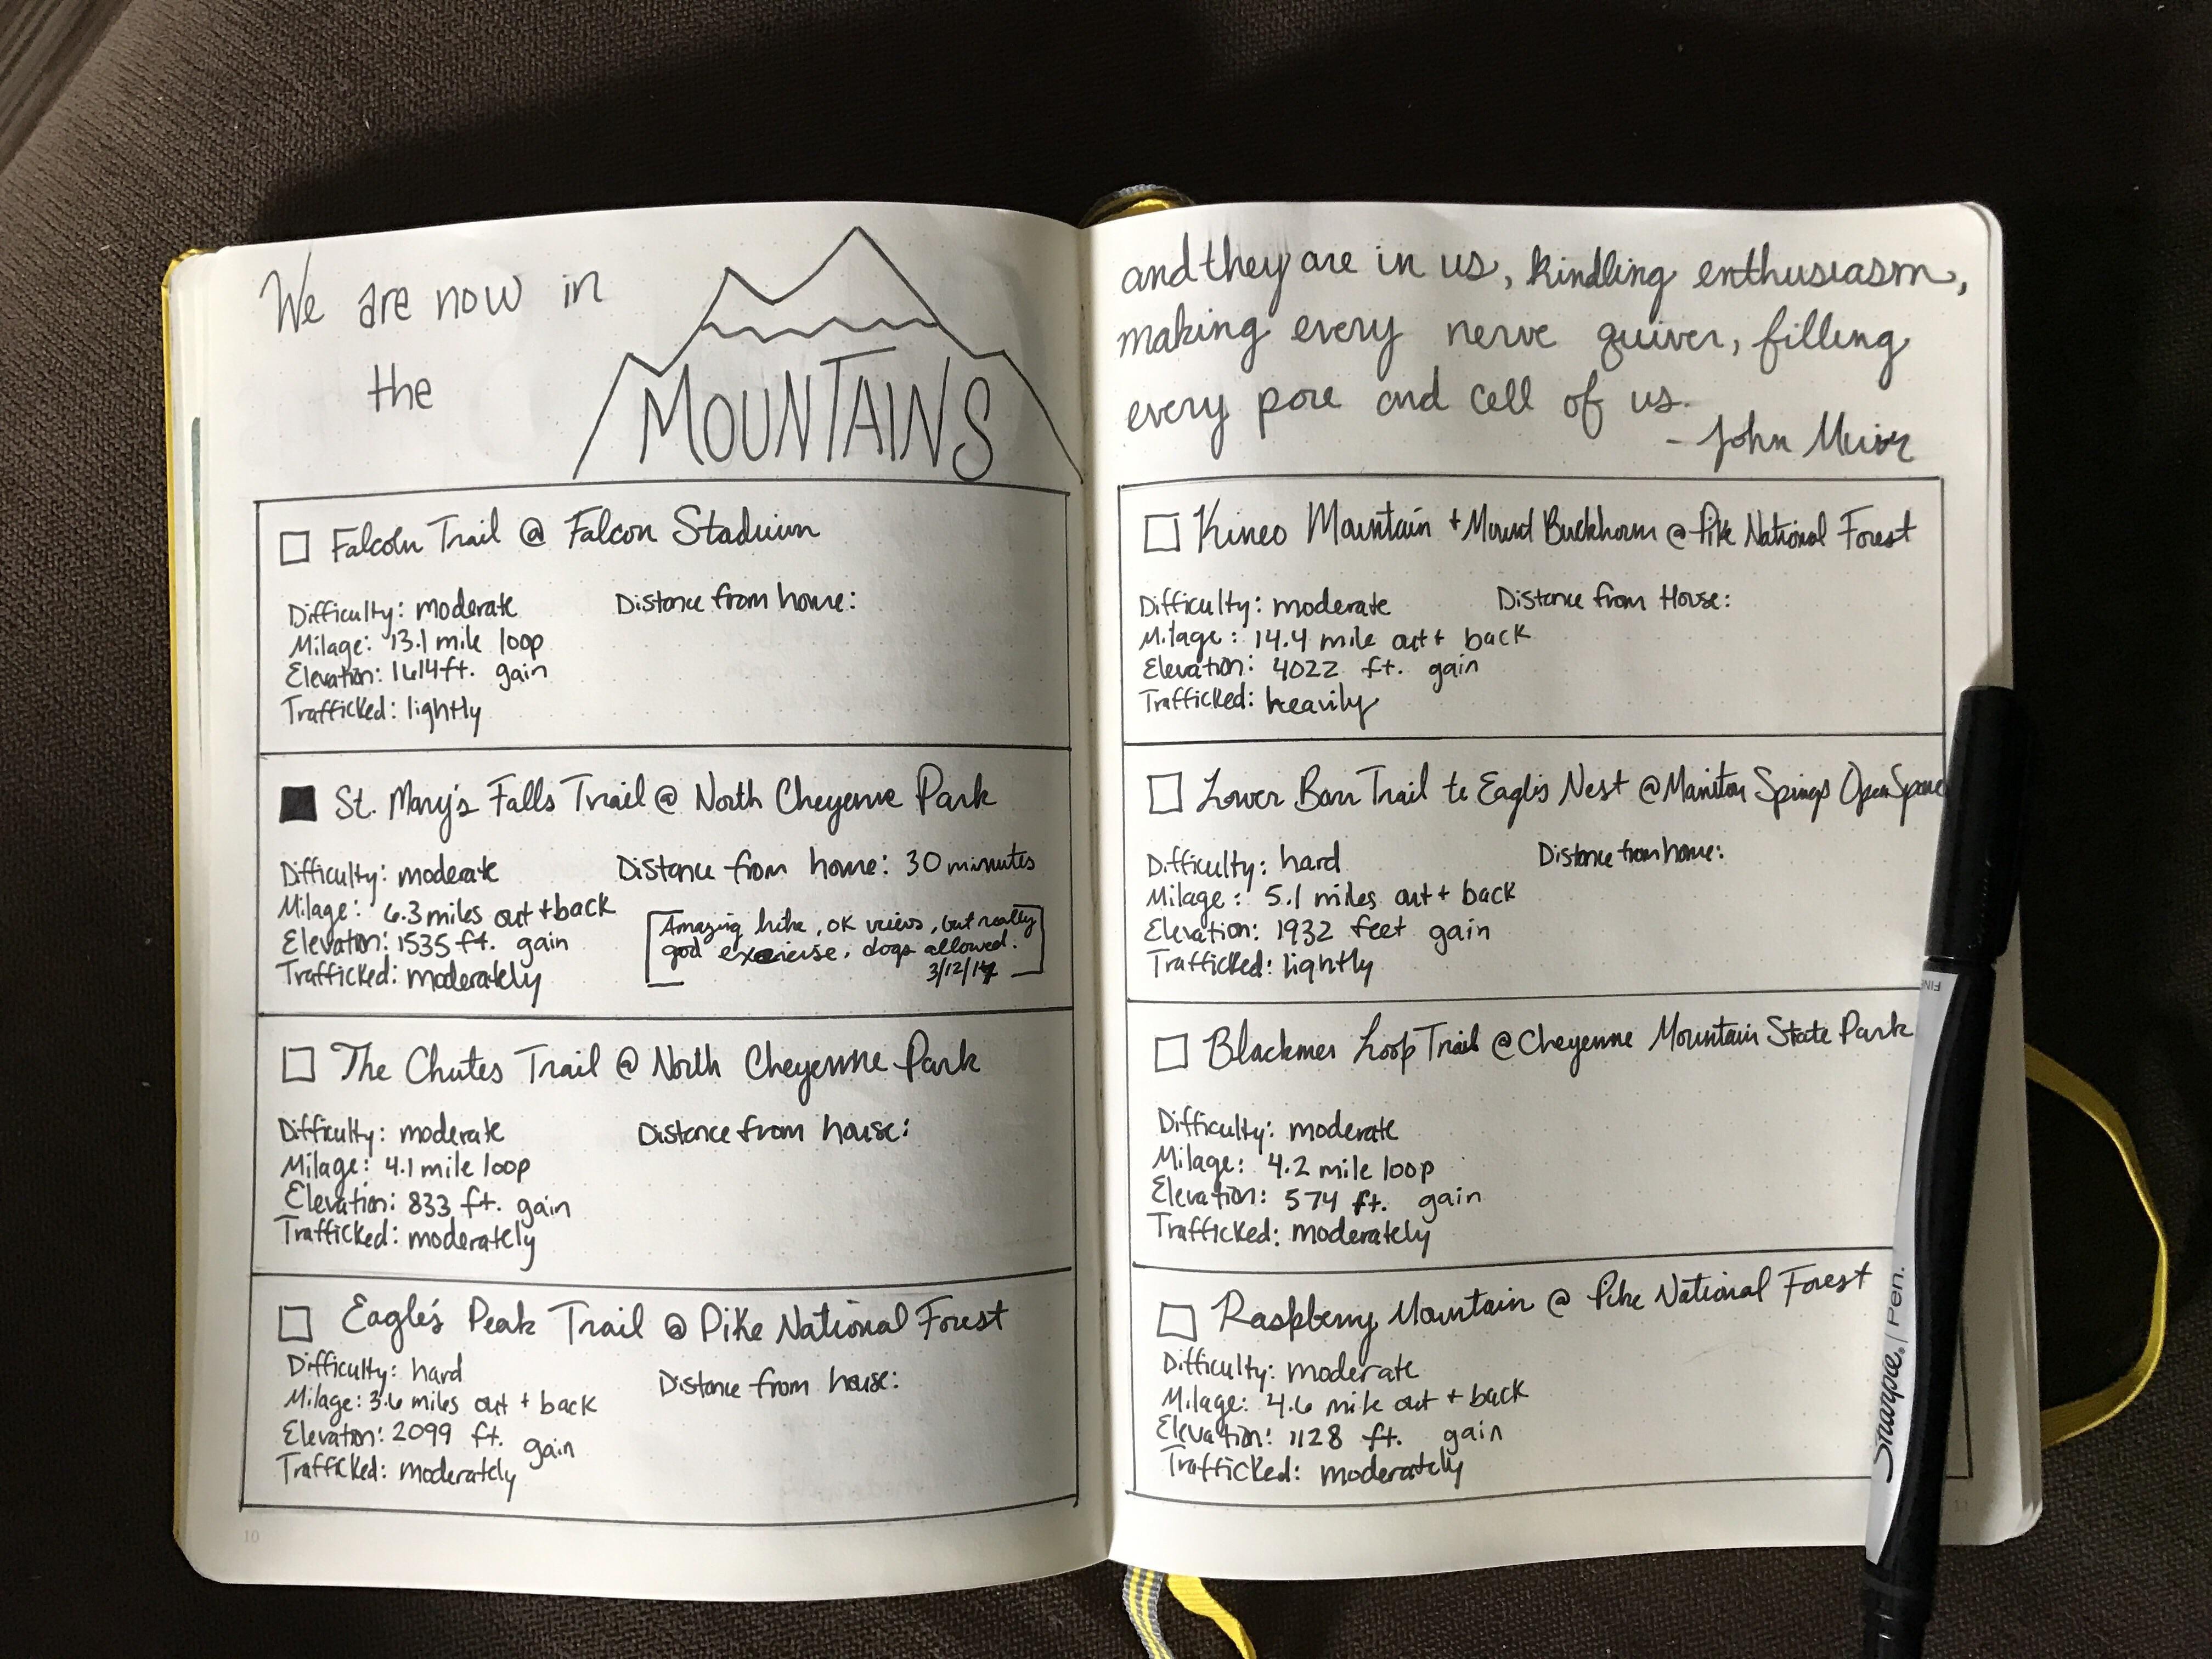 Pin by Stephanie Senn on Hiking Log Book Ideas | Bullet